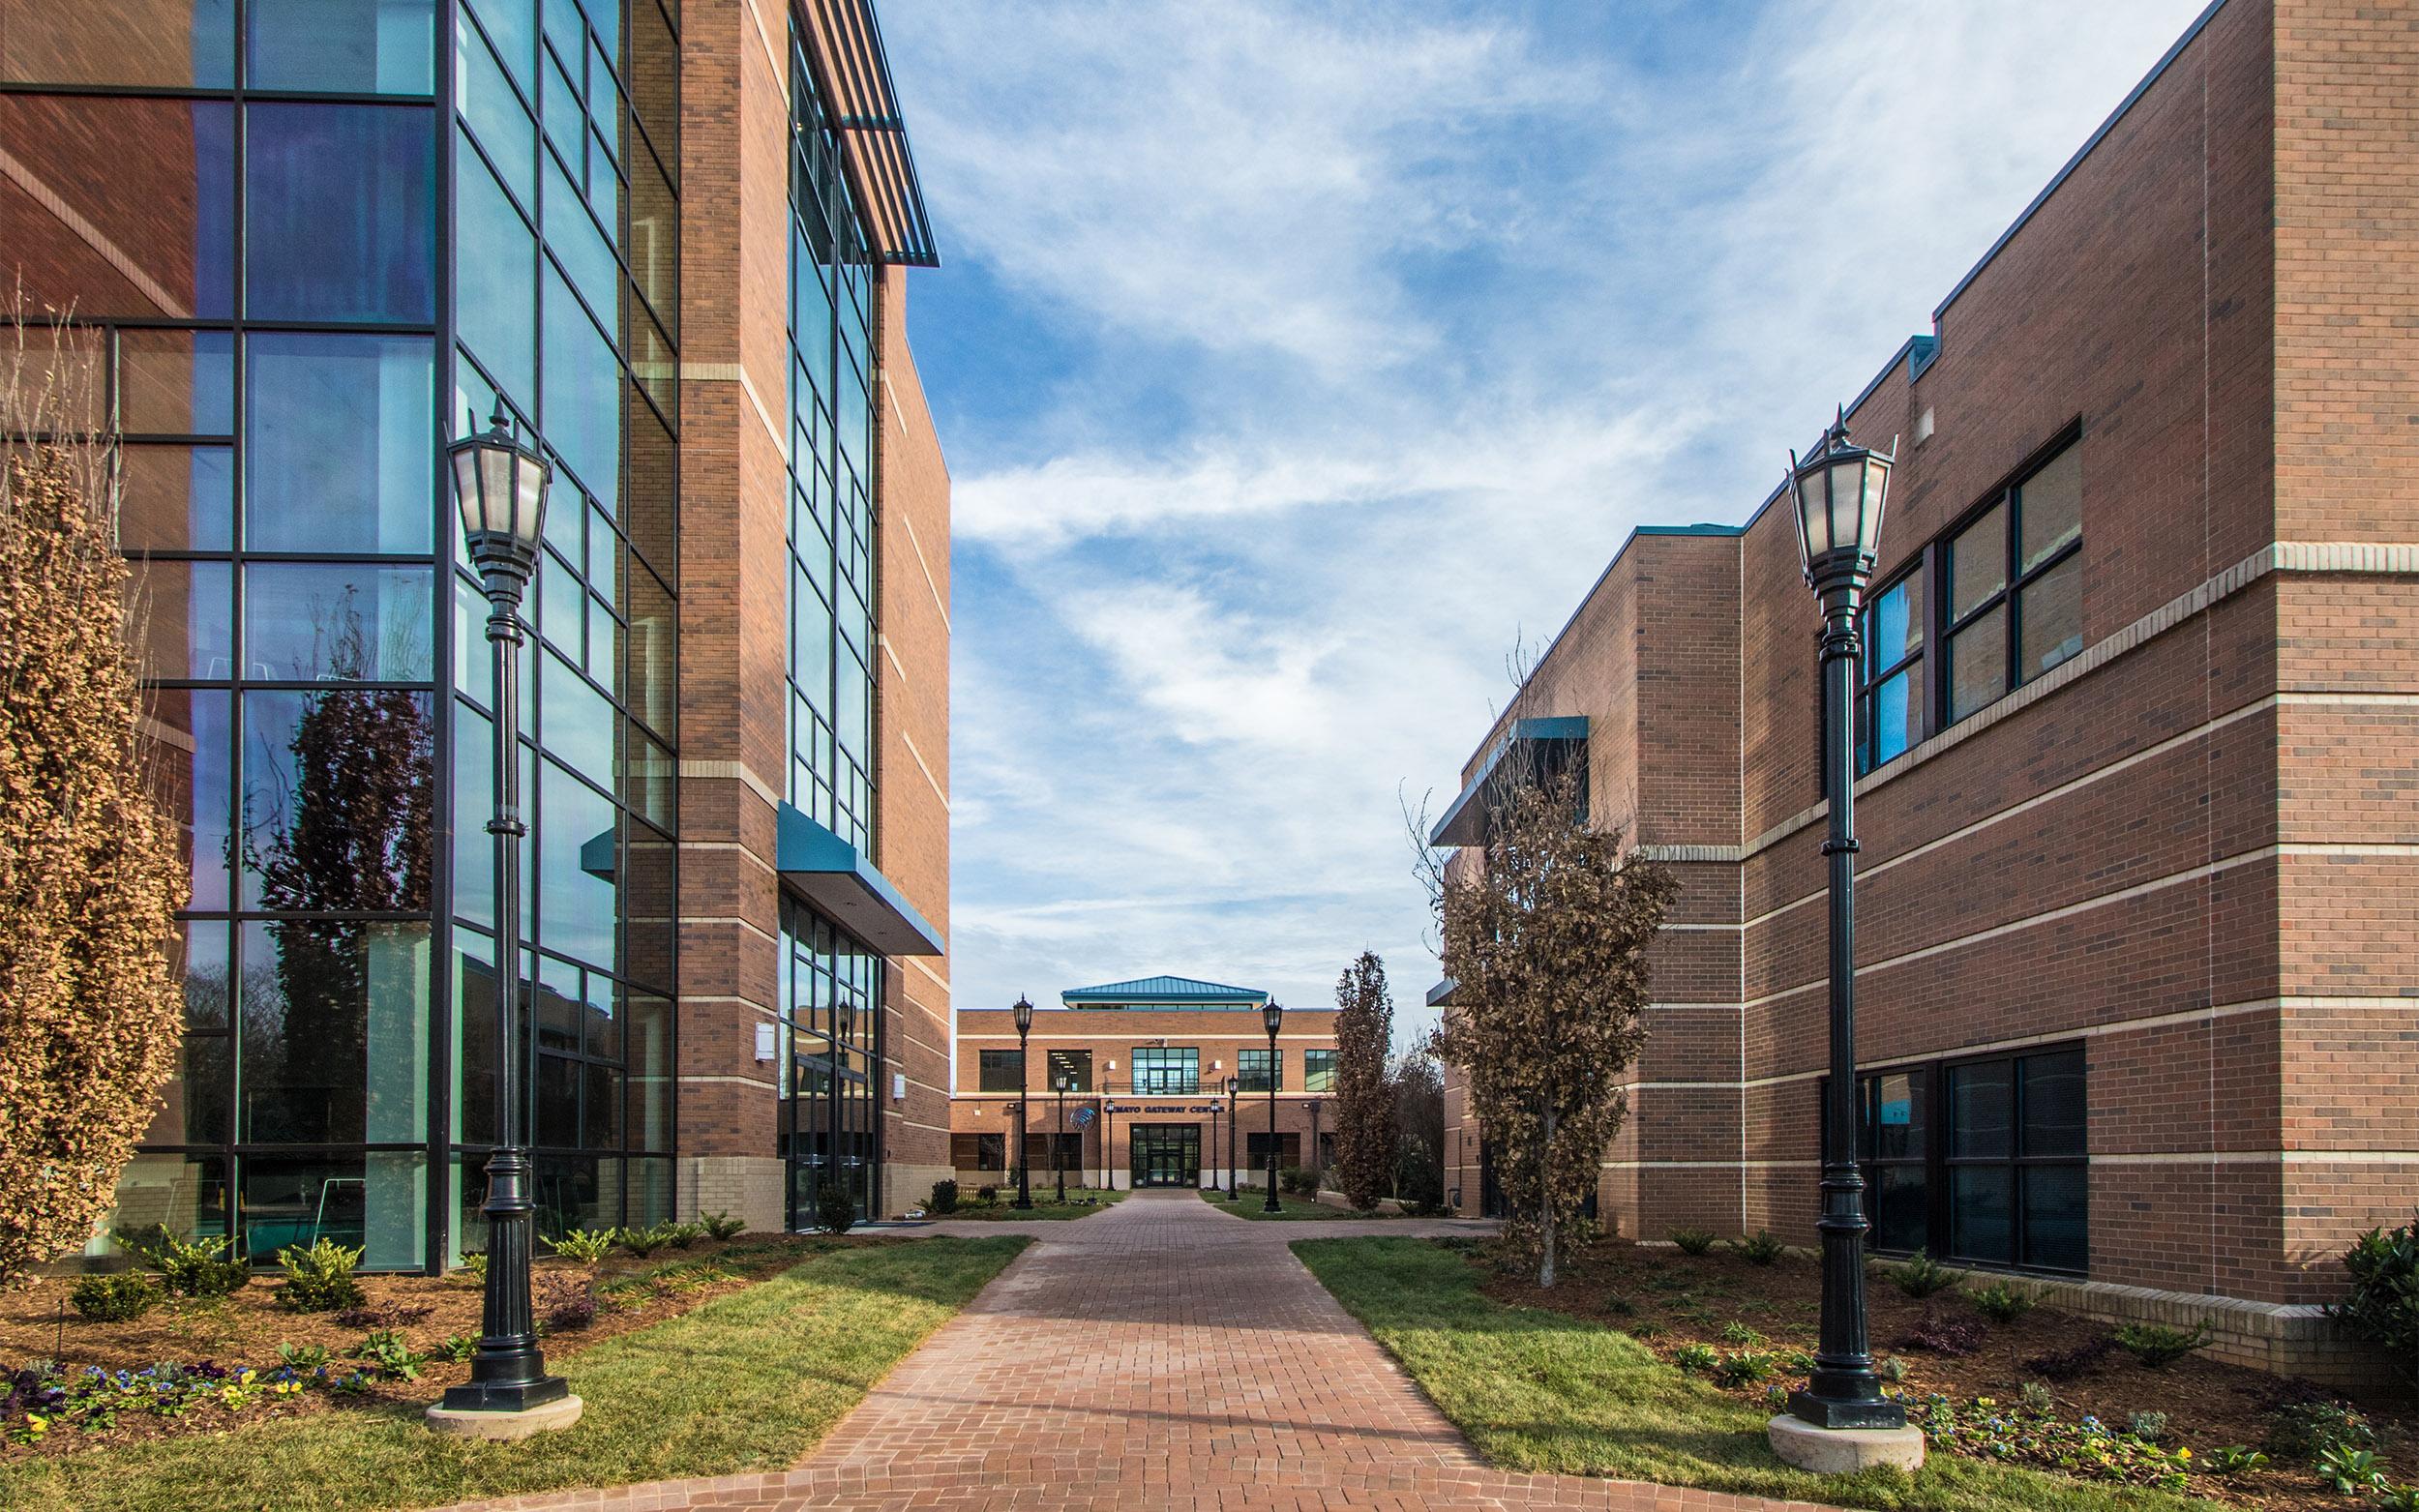 Providence Day School Academic Center